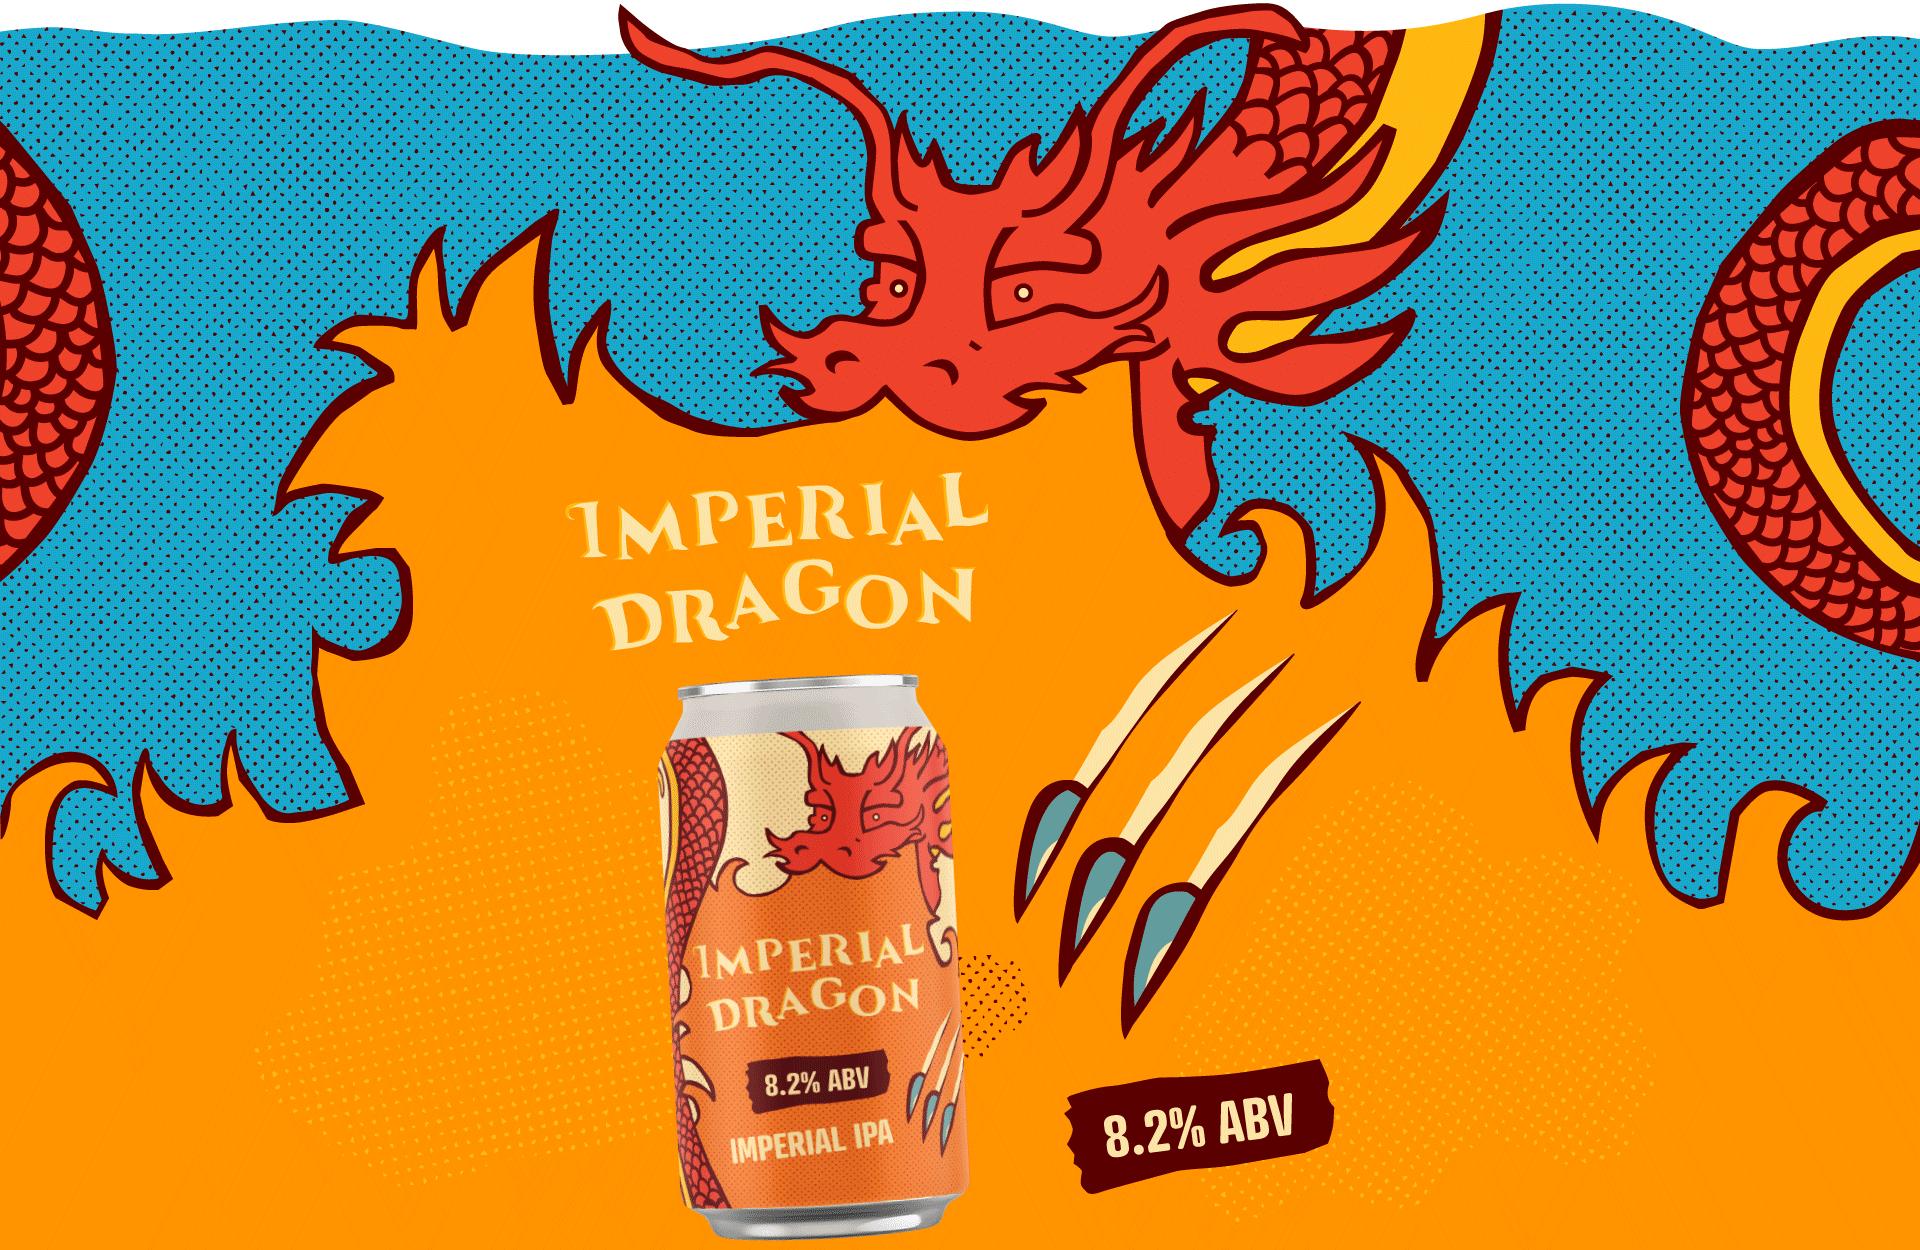 Imperial Dragon illustration